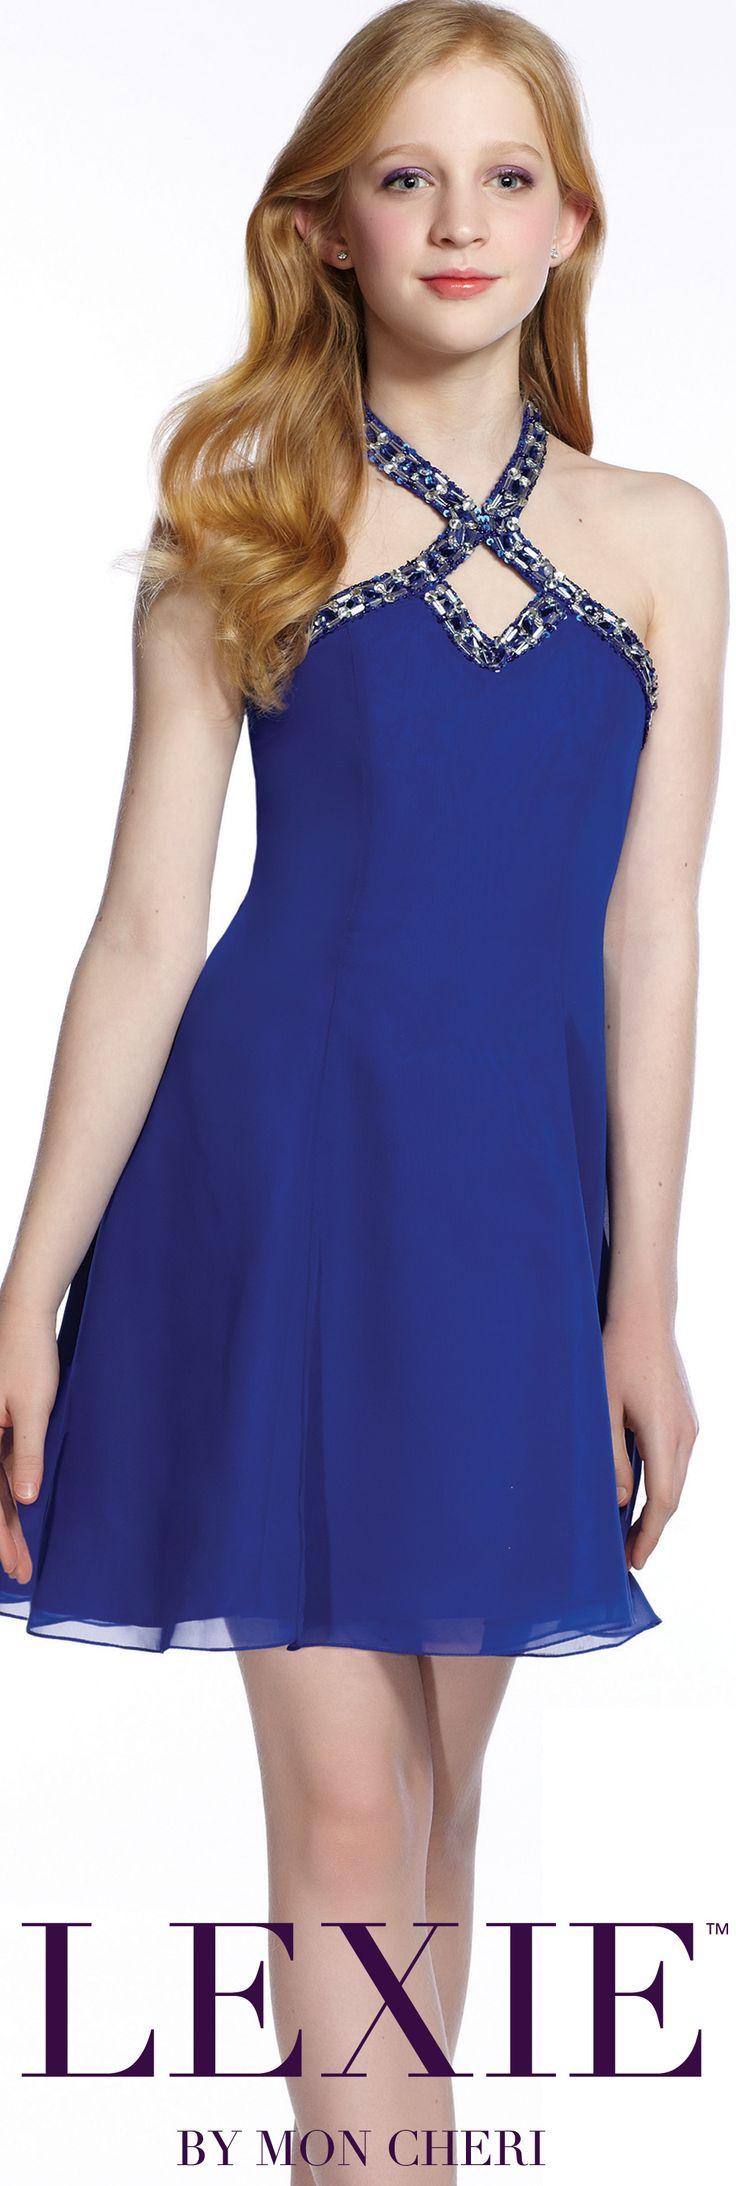 Lexie by Mon Cheri - Tween Formal Dress - Style No. TW21541 moncheriprom.com #8thGradeFormalDress